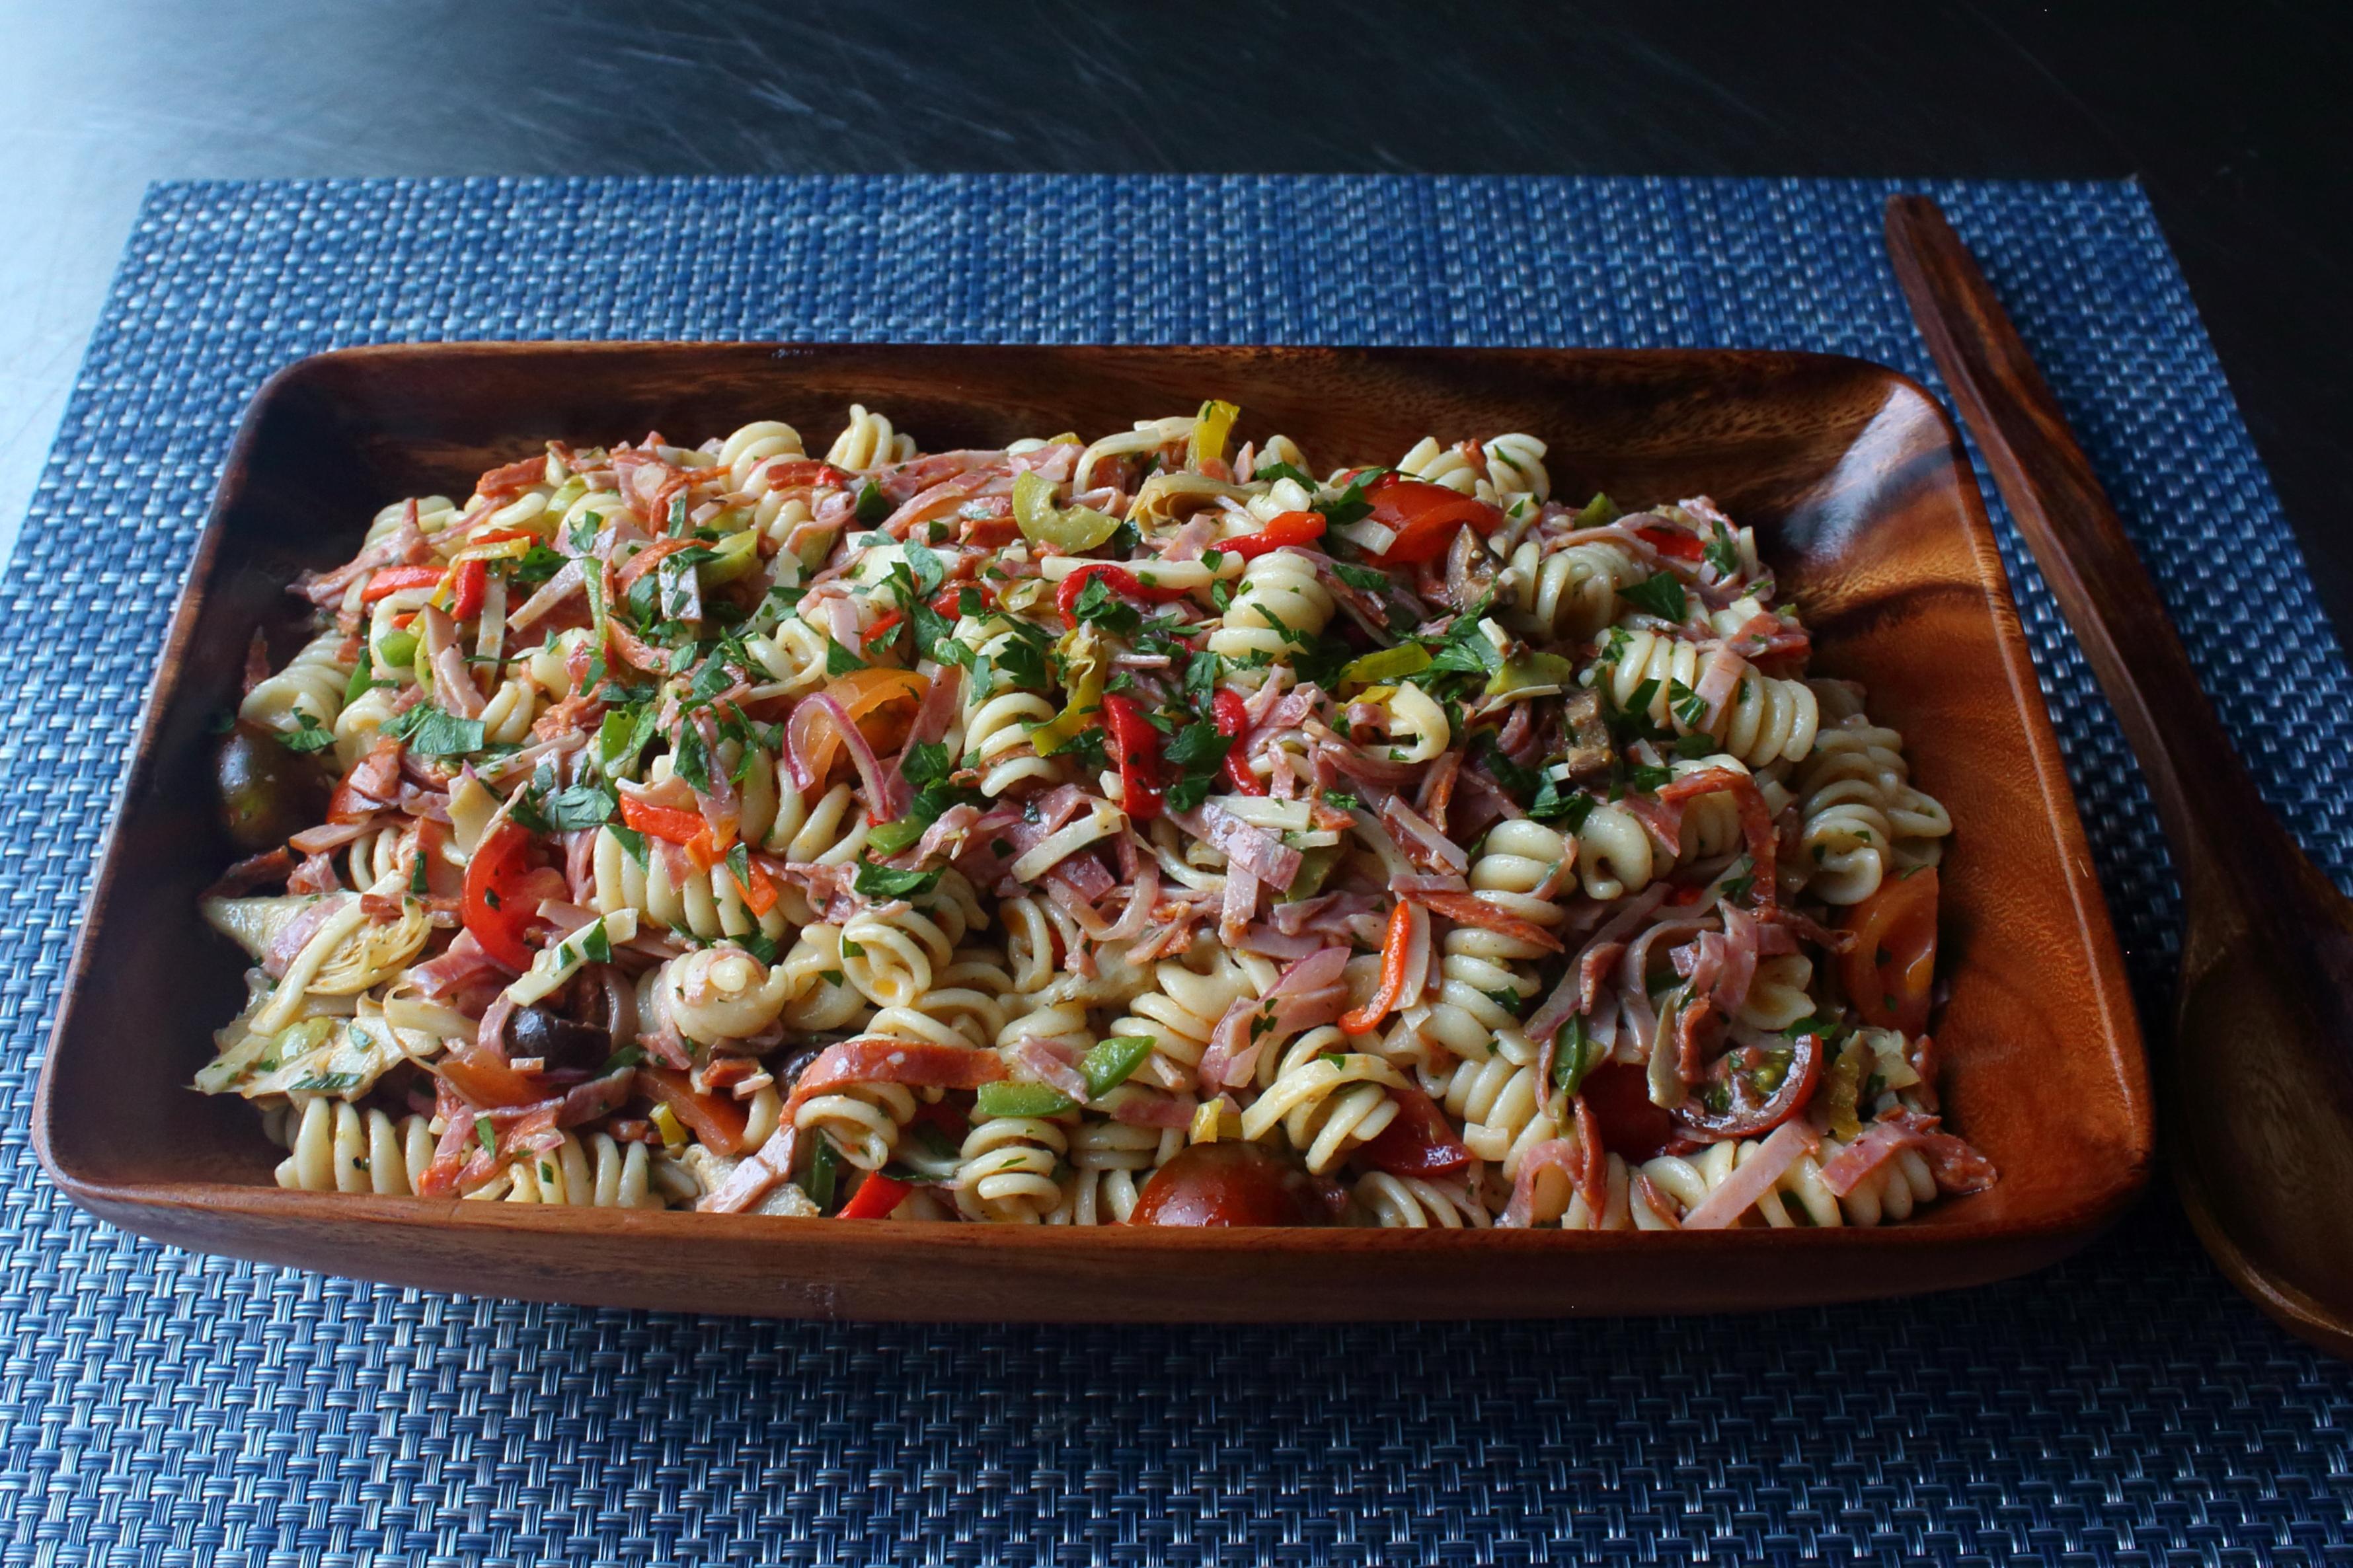 Chef John's Antipasto Pasta Salad